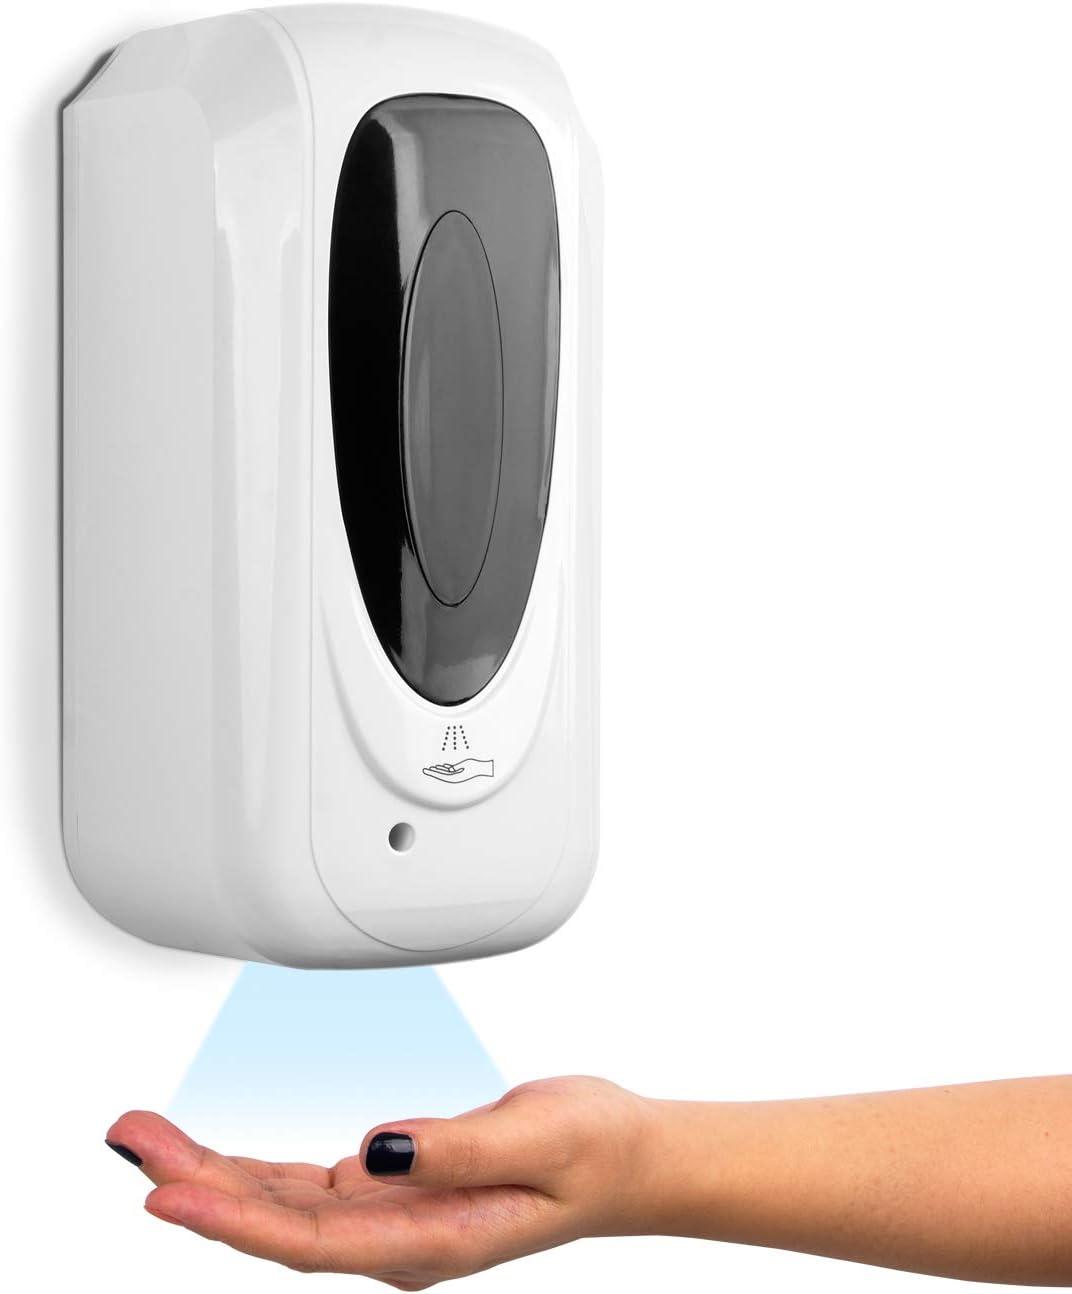 Automatic Liquid Hand Sanitizer Dispenser Touchless Soa - Genuine Free Shipping Oakland Mall 1000ml